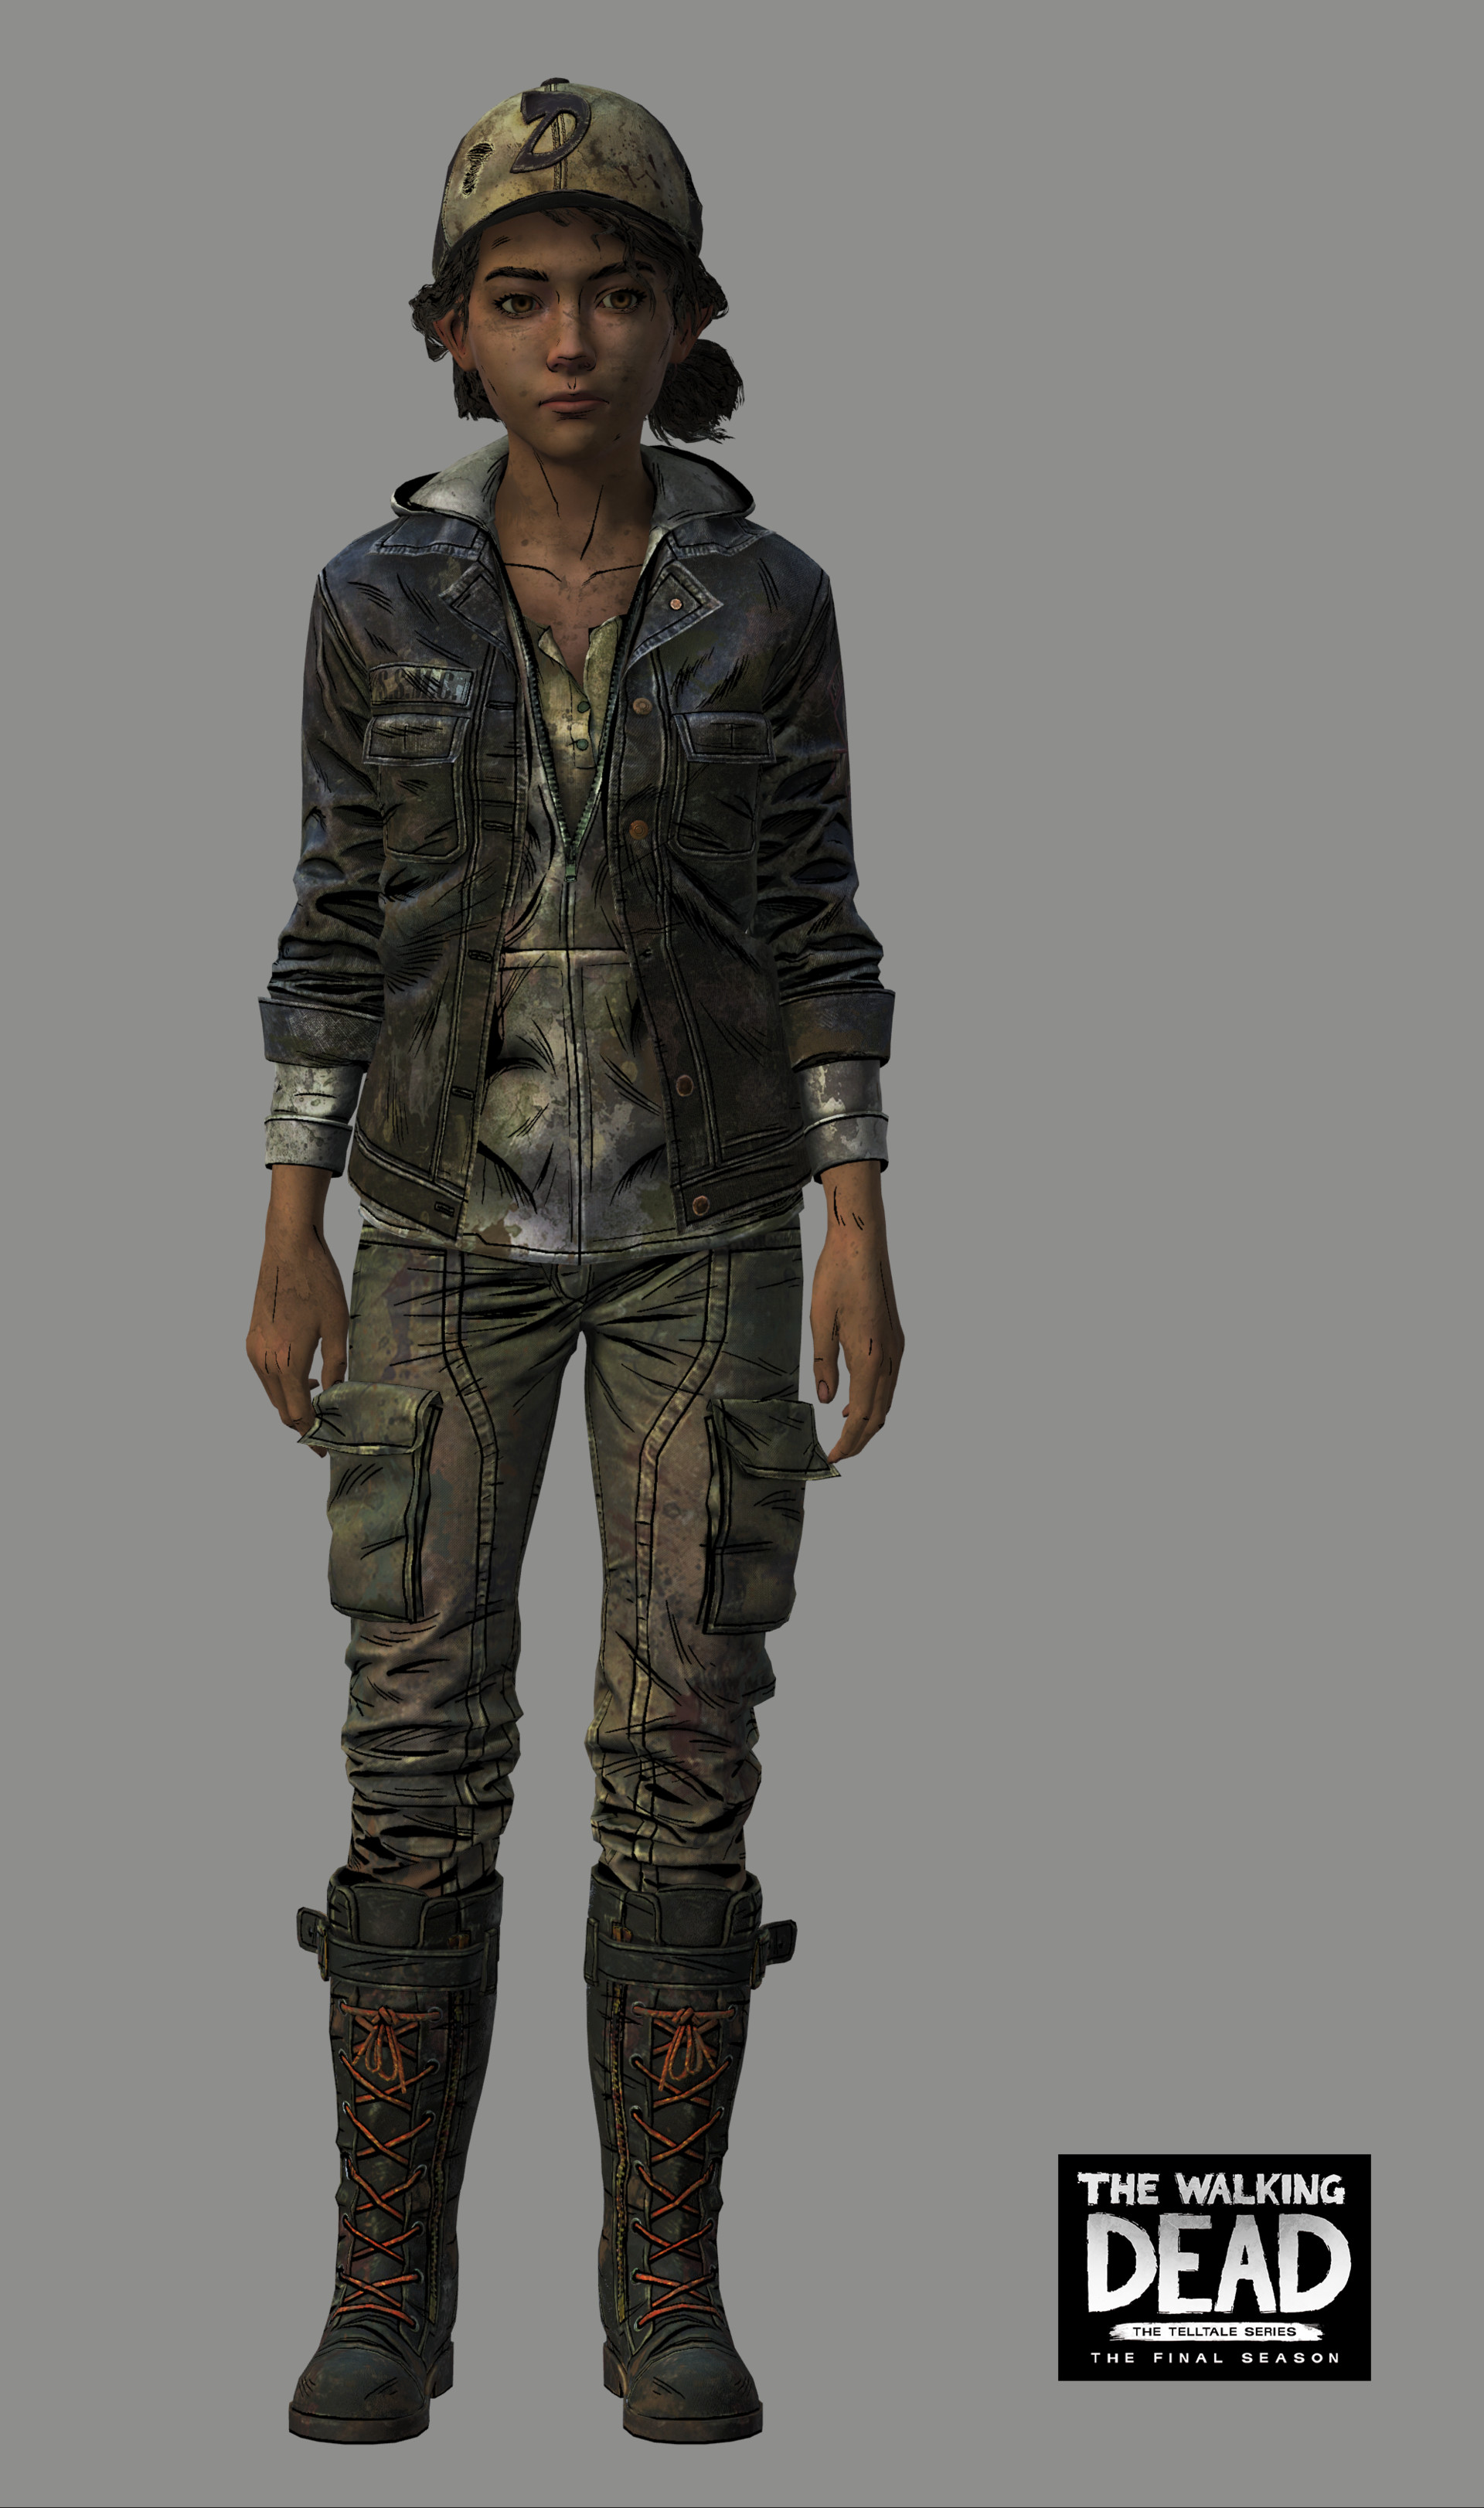 The Walking Dead The Final Season Concept Art